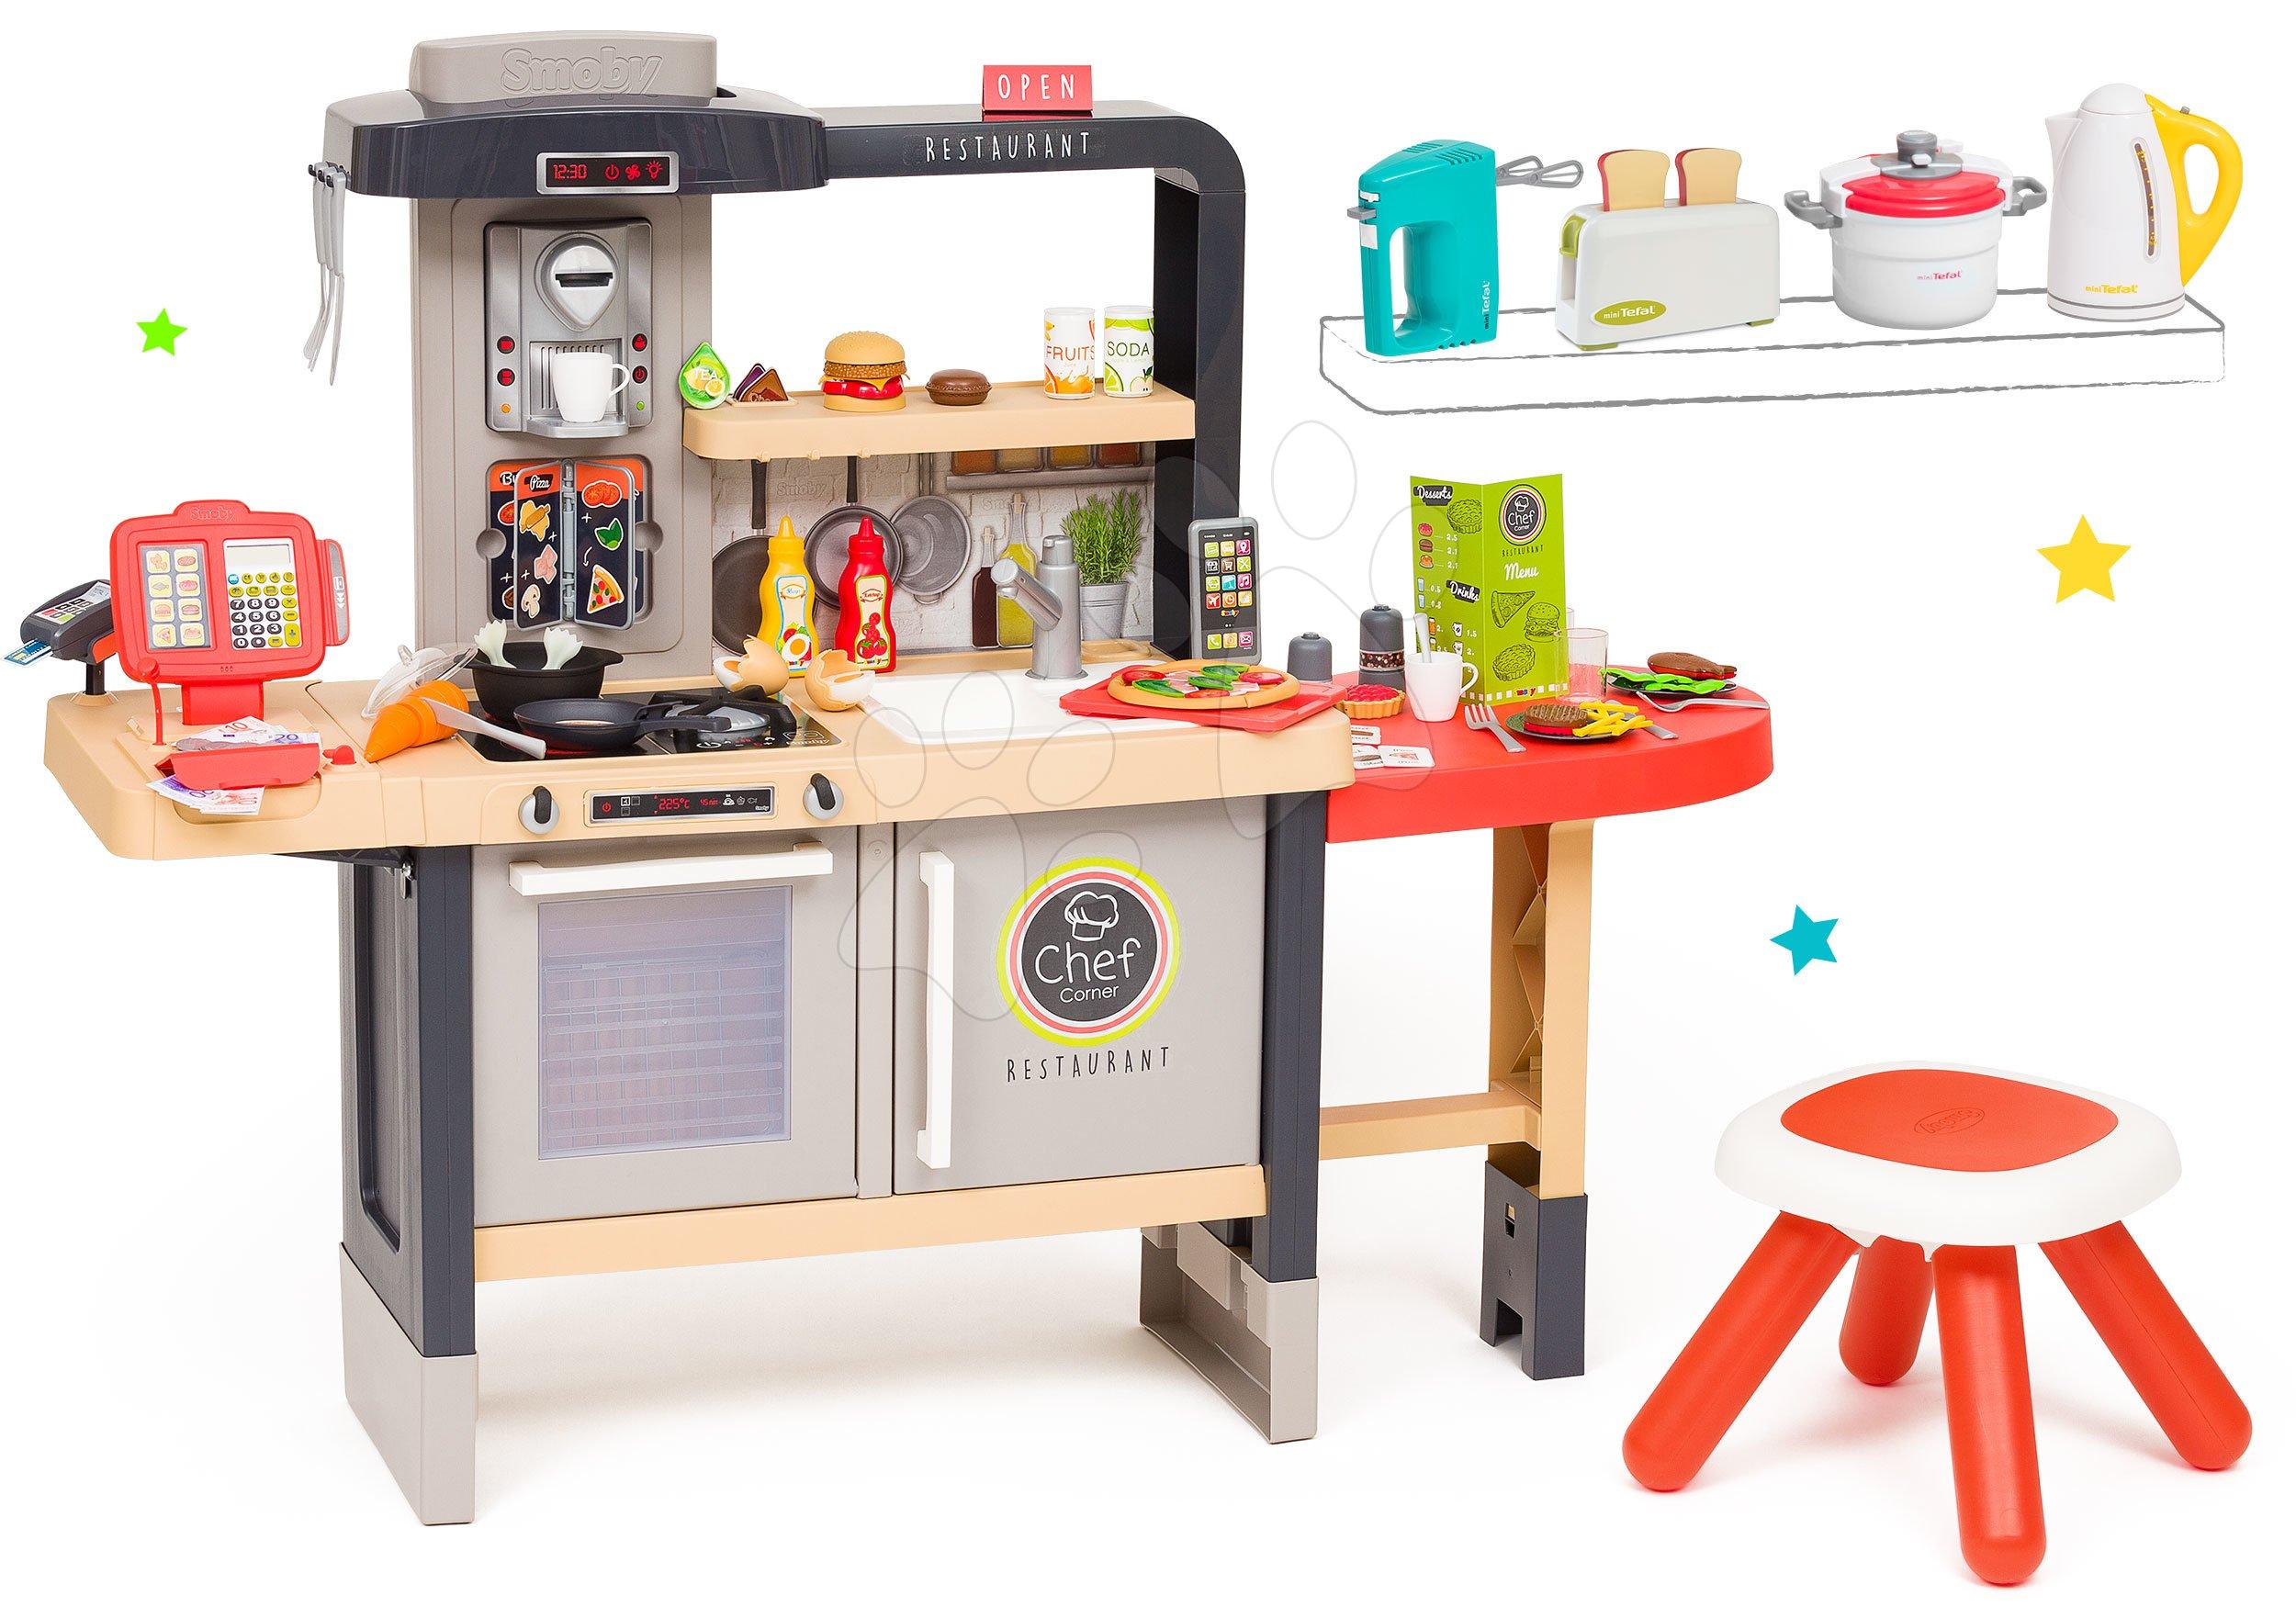 Set reštaurácia s elektronickou kuchynkou Chef Corner Restaurant Smoby s kuchynskými spotrebičmi Tefal